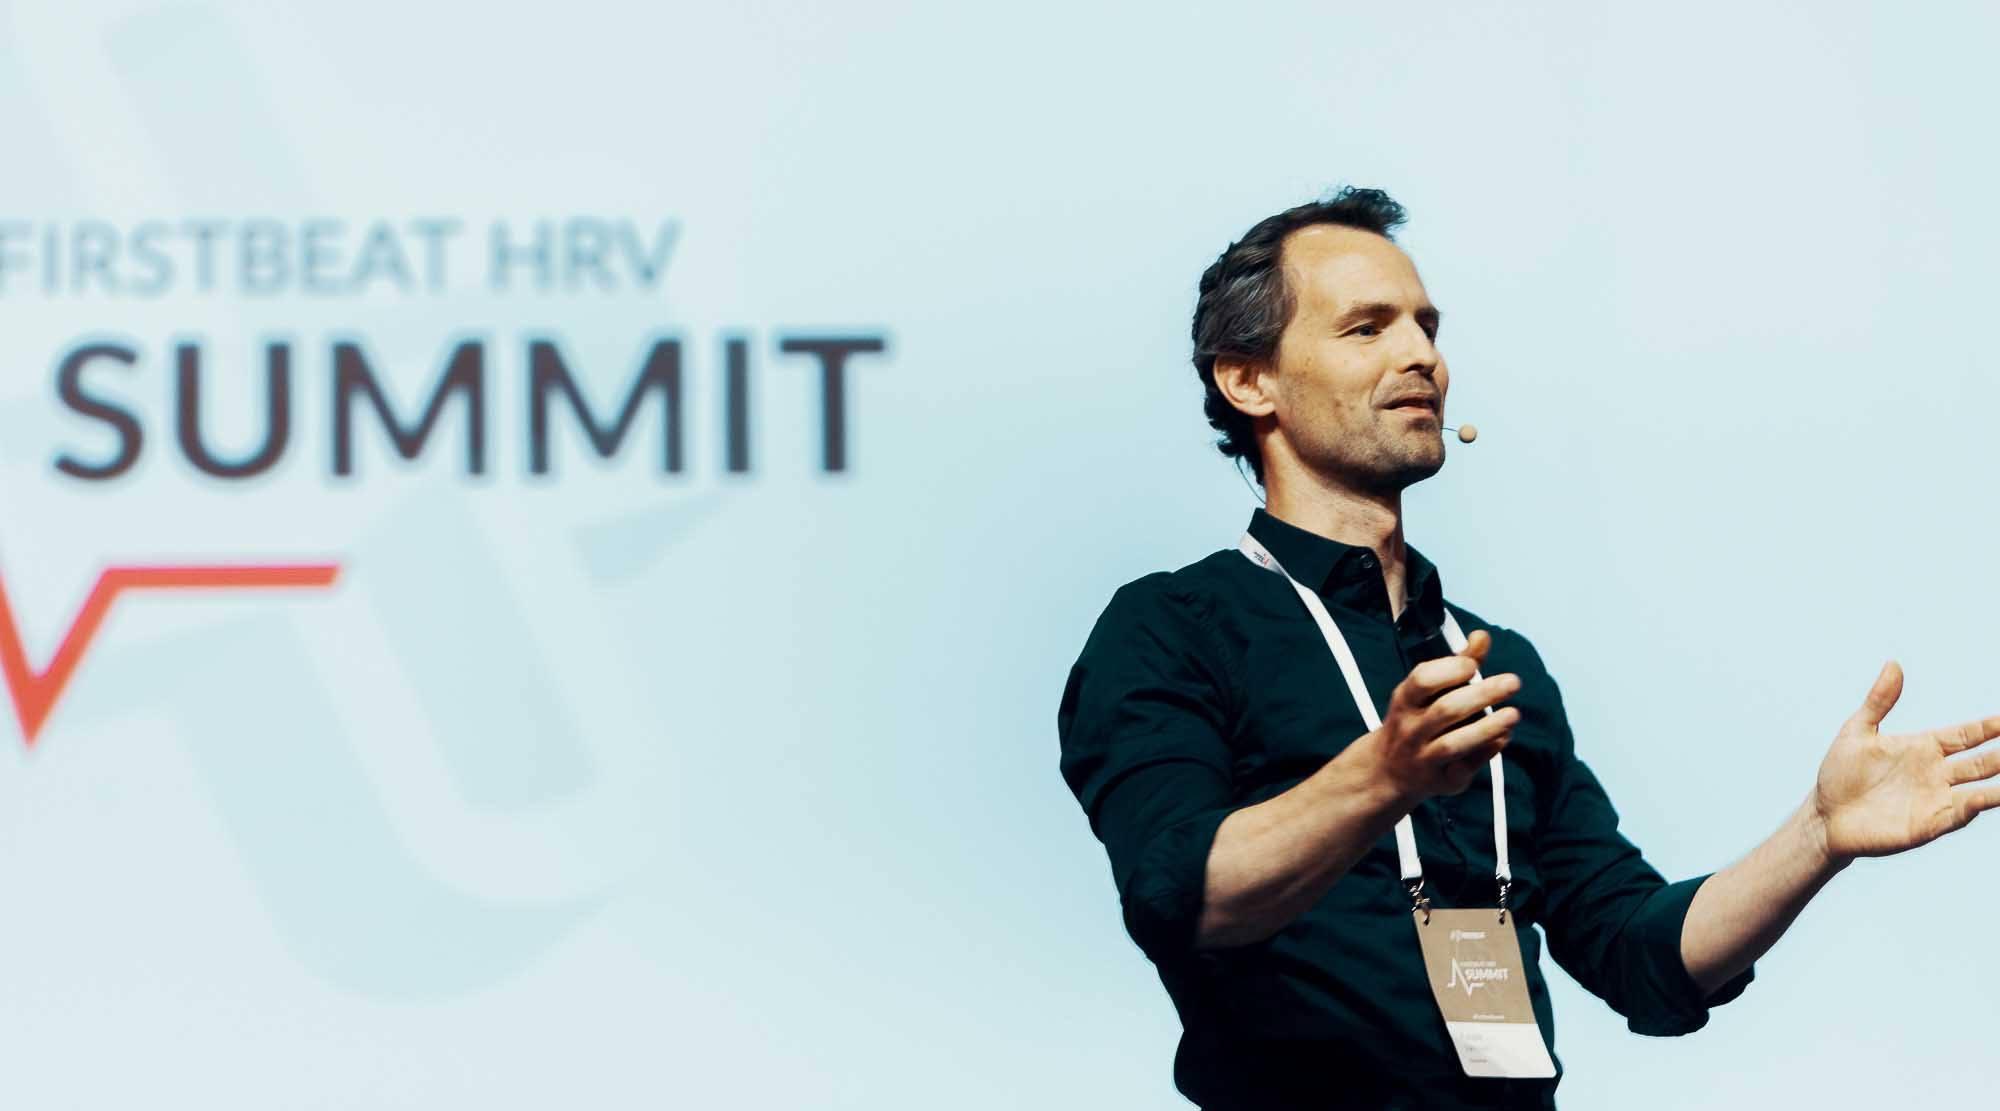 Kasper Janssen, Sport Physician & Director, Nap@Work